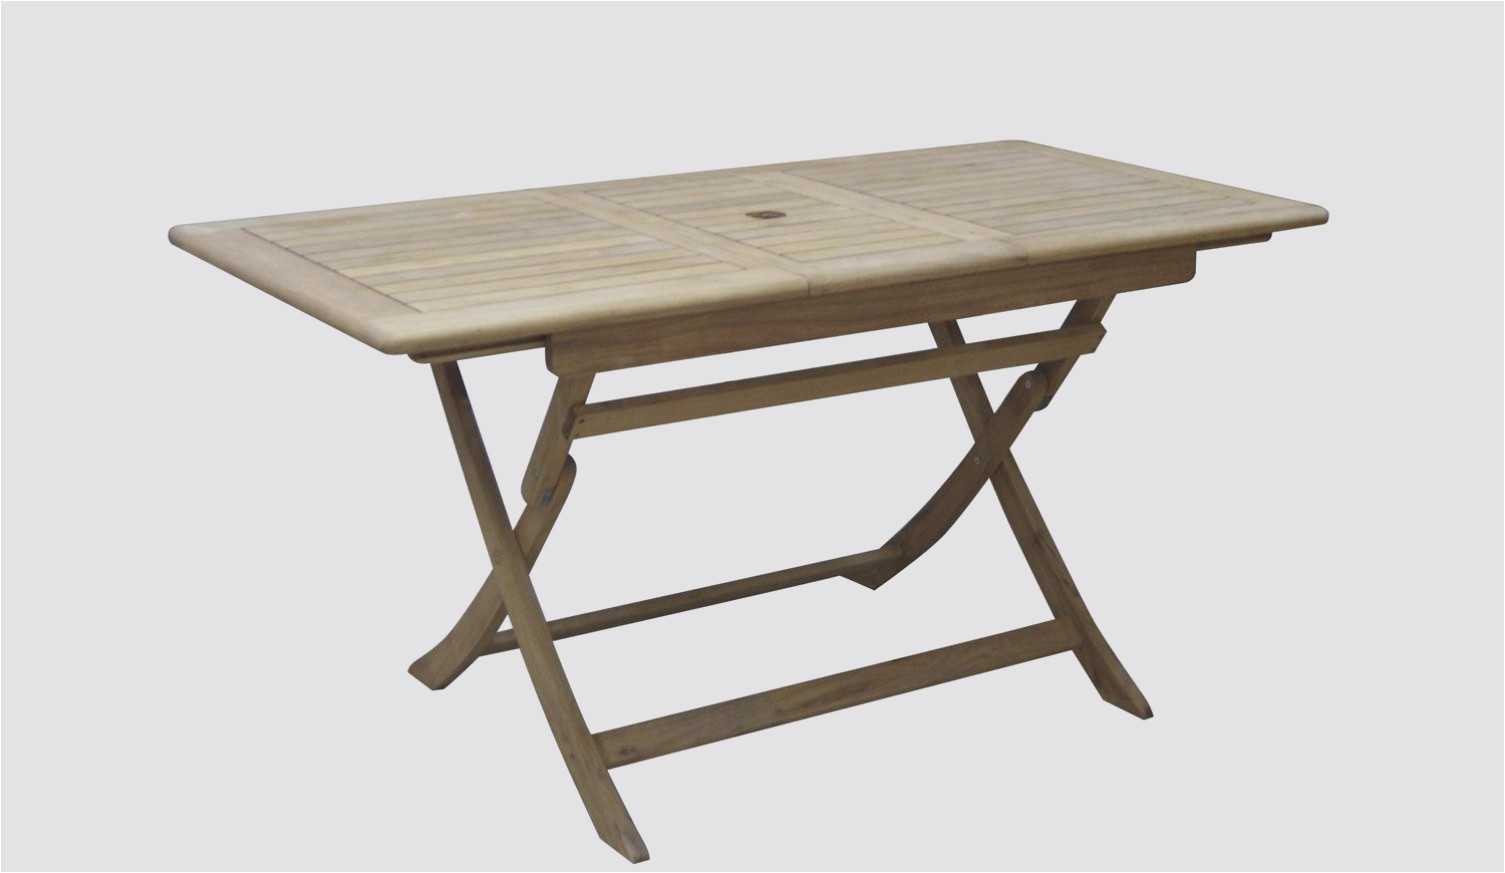 Chaises De Jardin Ikea Luxe Photos Table Pliante Jardin Ikea Aussi Voguish Table Et Chaise De Jardin